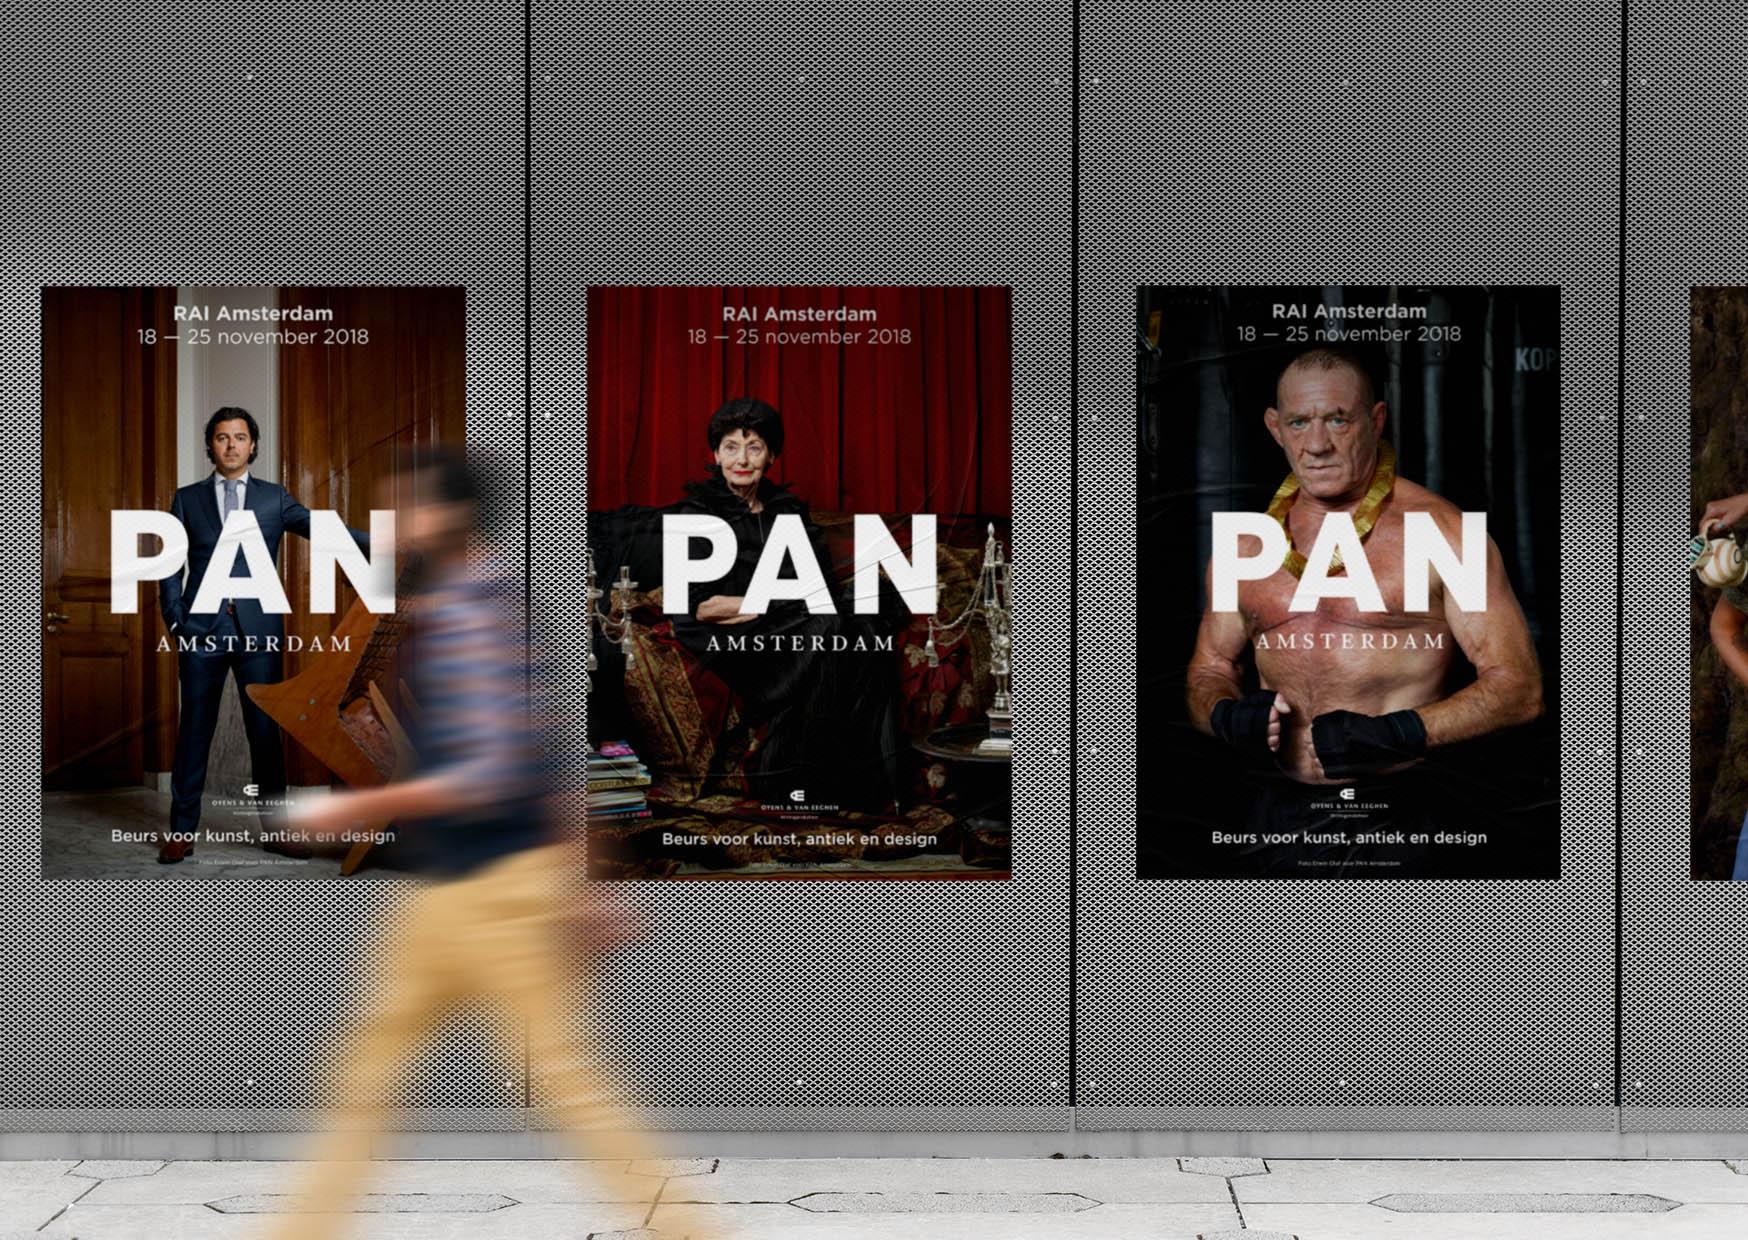 PAN Amsterdam, Amsterdam, 2018, beurs, kunst, art, fair, antiek, design, grafisch, ontwerp, grafisch ontwerp, graphic design, campagne, erwin olaf, fotografie, folder, pan podium, podium, flyer, editoriaal, erwin olaf, plattegrond, plattegrondbord, folder, bord, signing, beurs, tas